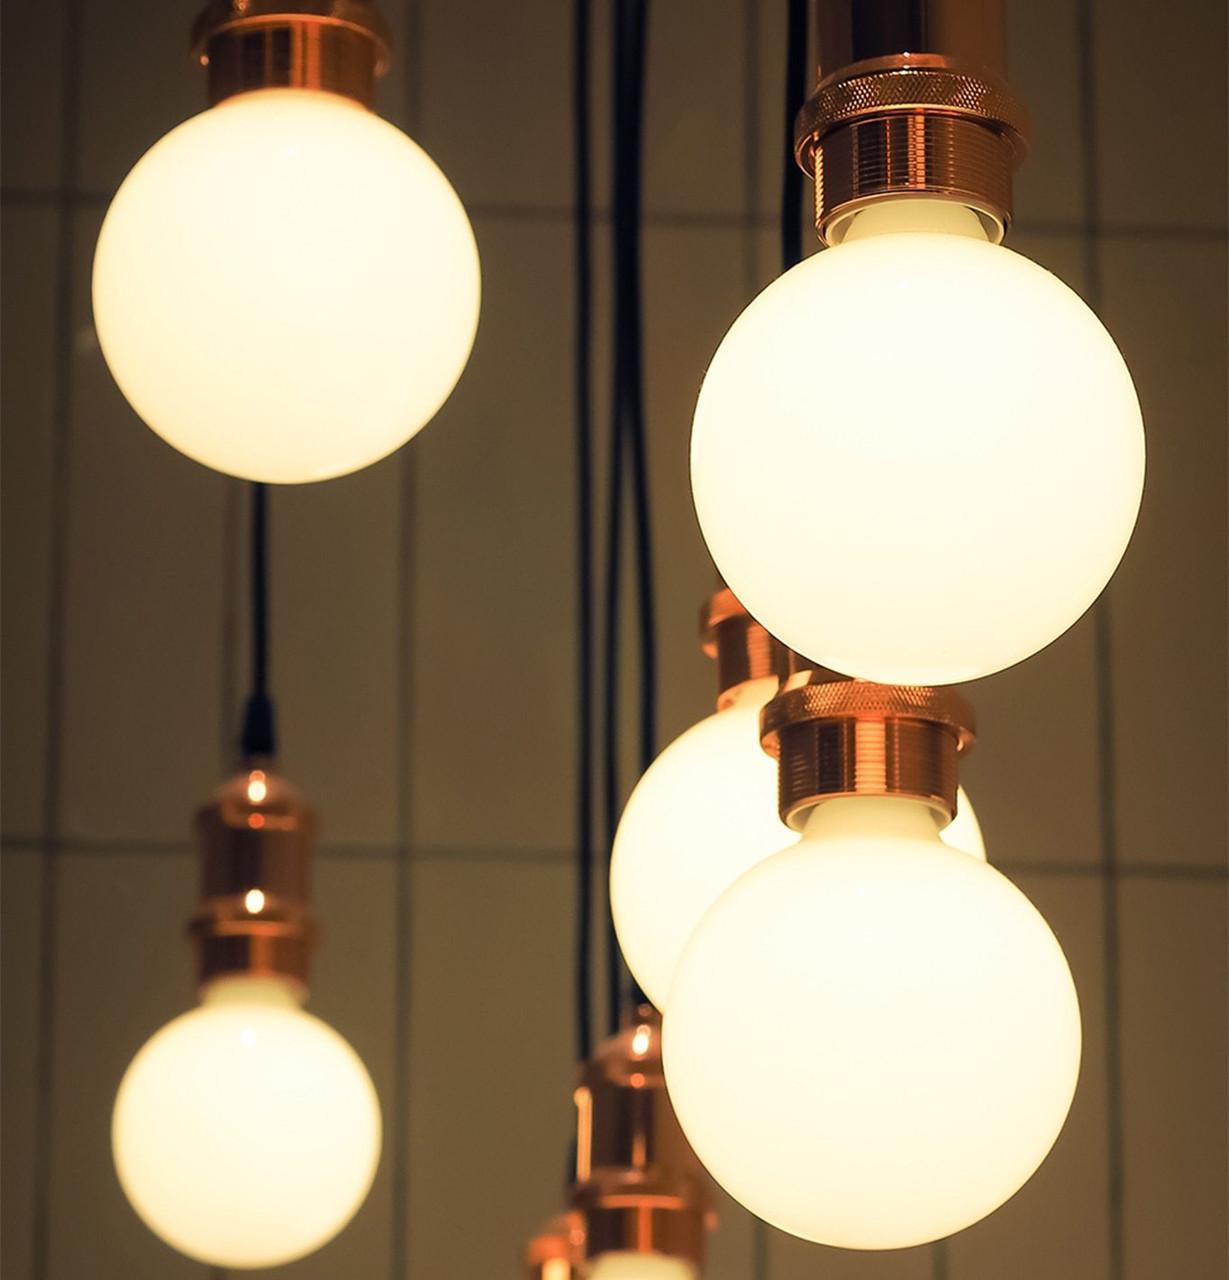 LED Dimmable G95 E27 Light Bulbs